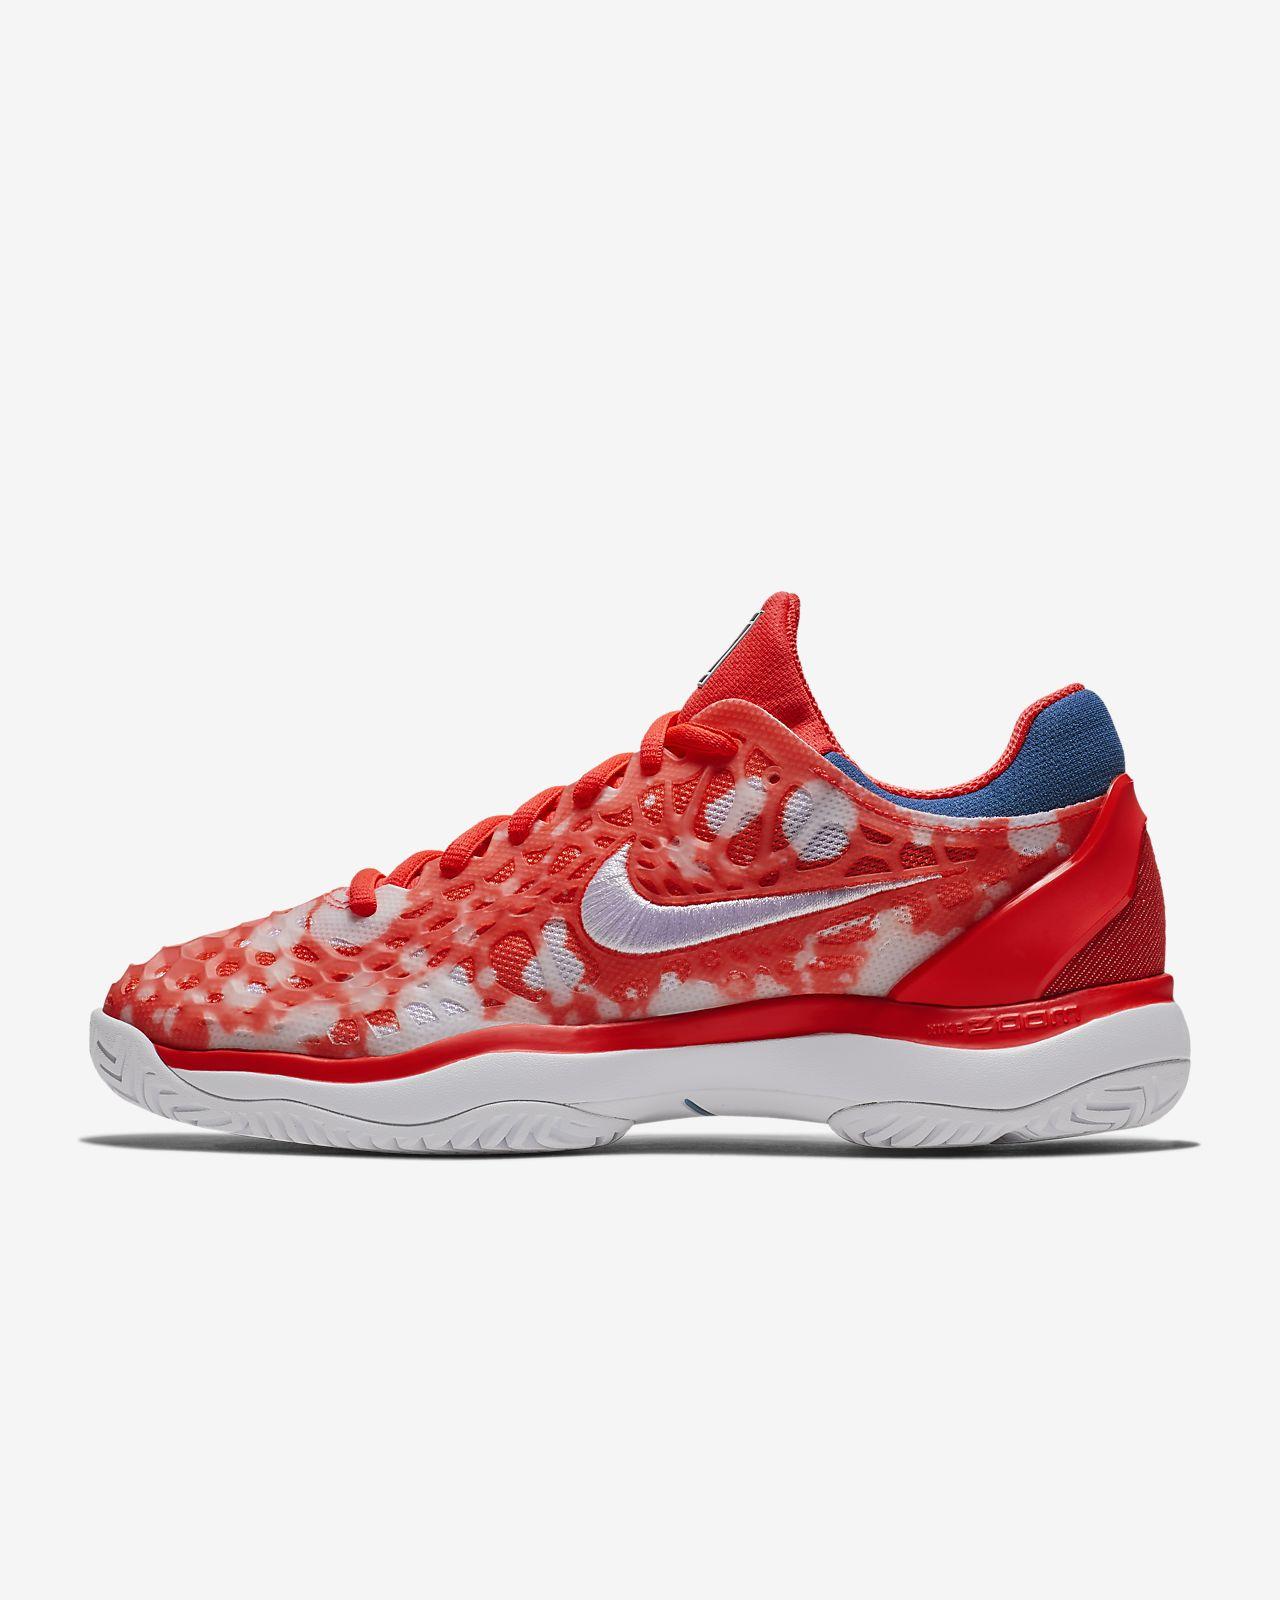 76596952cd0 Calzado de tenis para mujer NikeCourt Air Zoom Cage 3 Premium. Nike ...